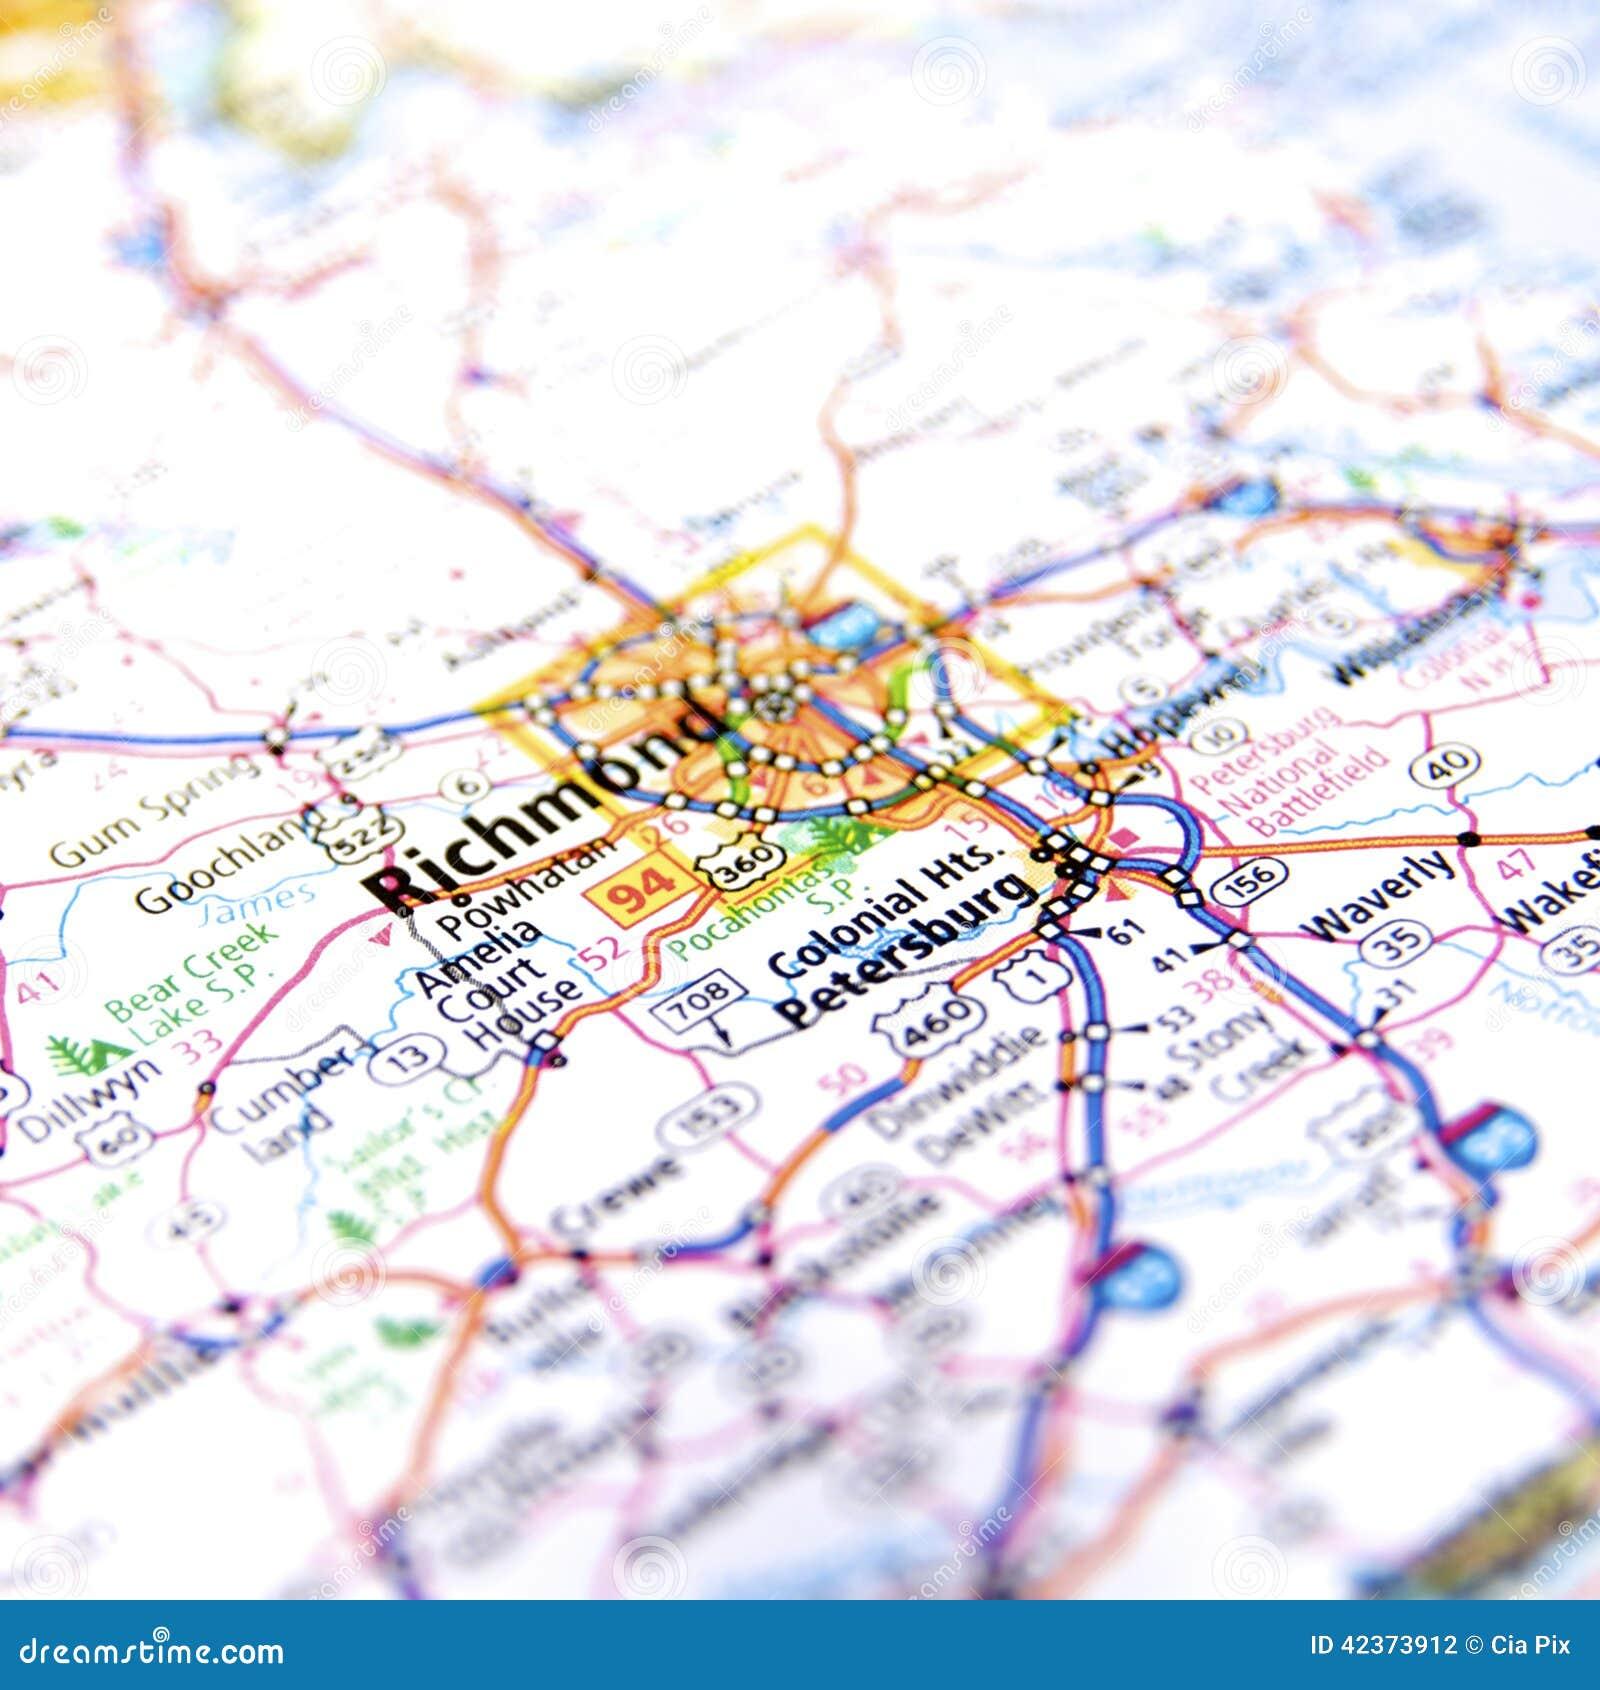 Richmond Virginia Road Map Stock Photo  Image 42373912